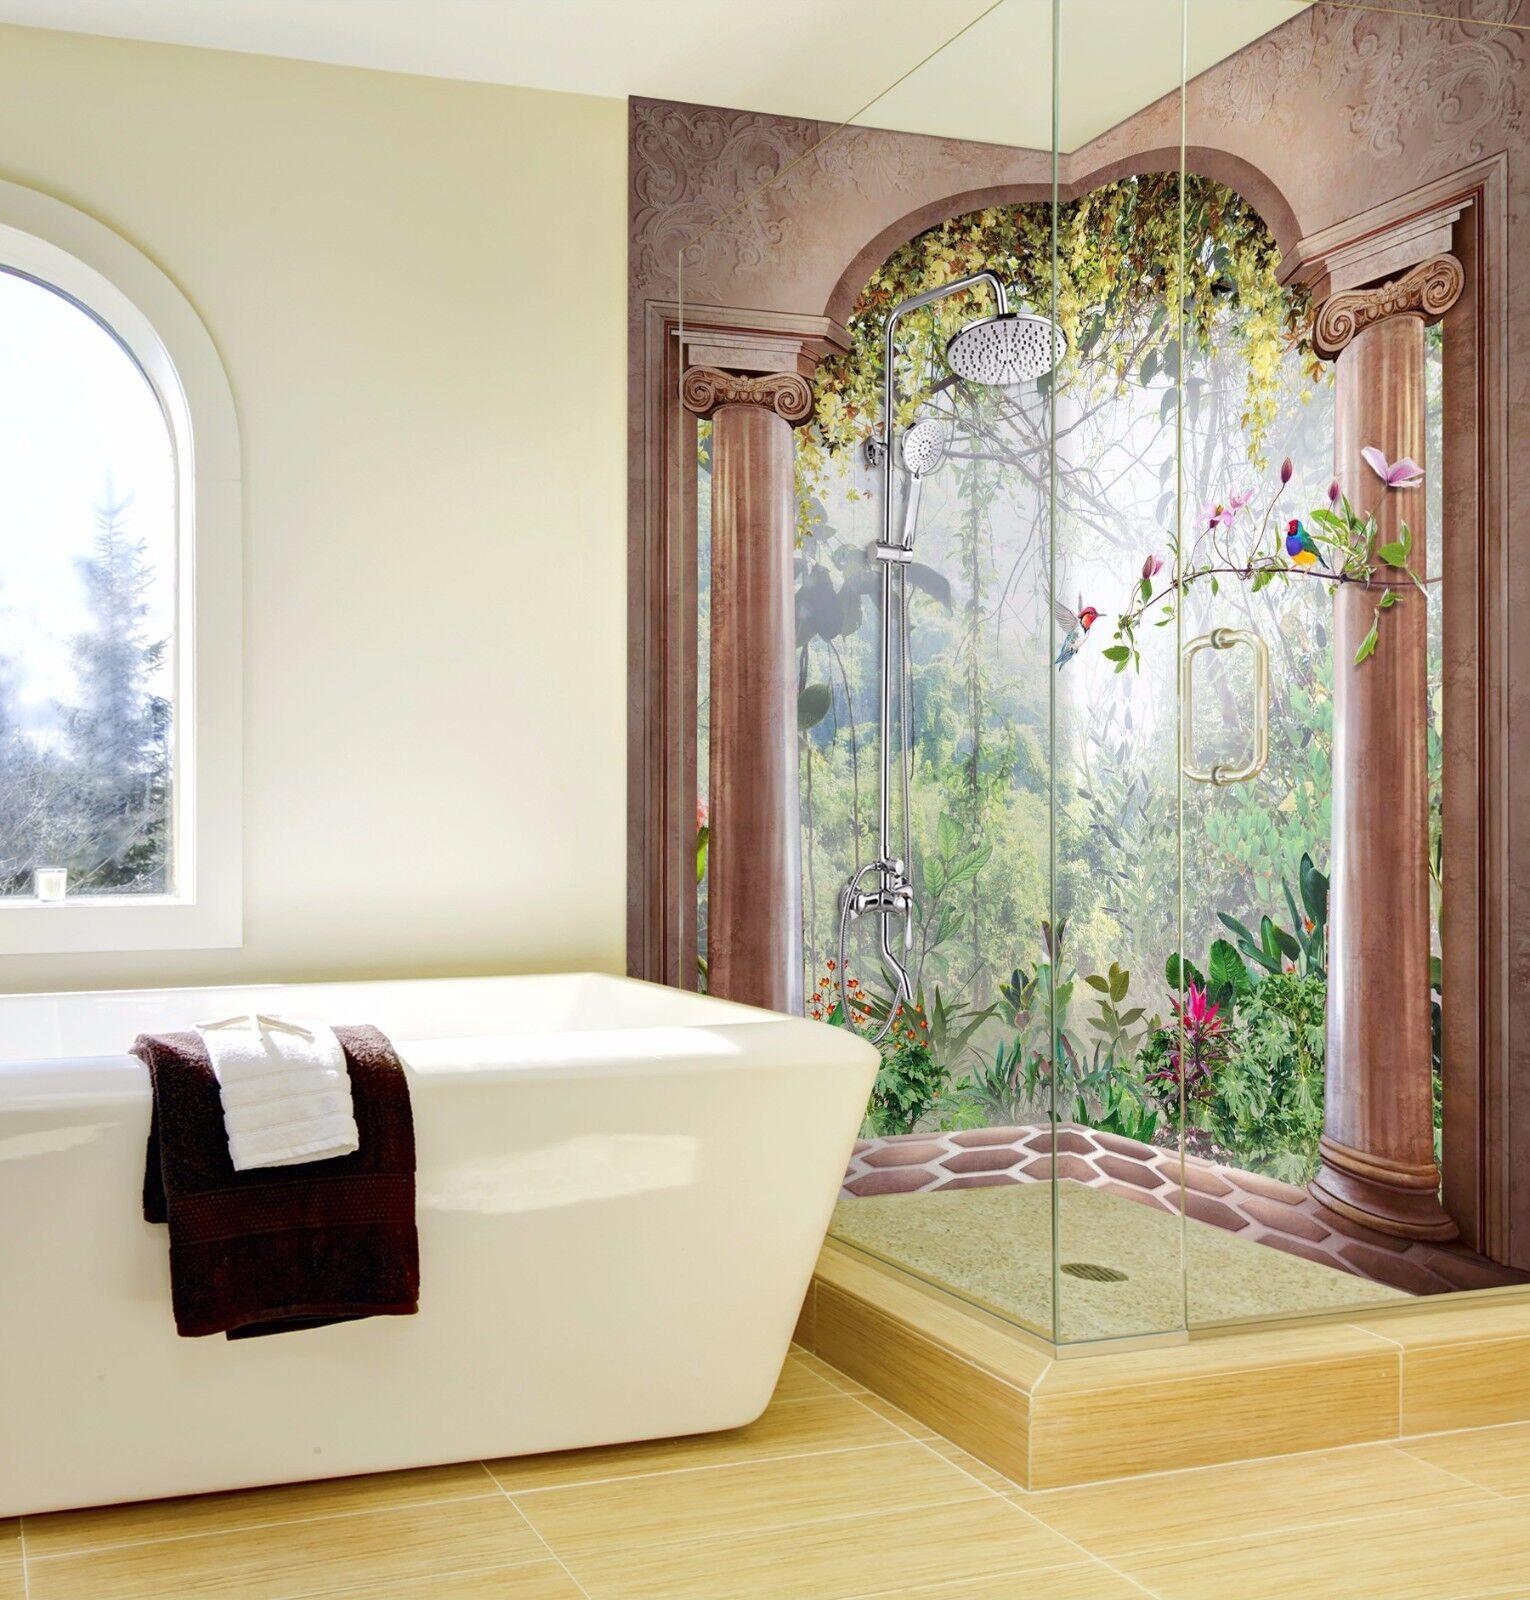 3D Forest Bird 647 Wallpaper cuarto de baño impresión impresión impresión Calcomanía Pared Deco AJ Wallpaper au adb117